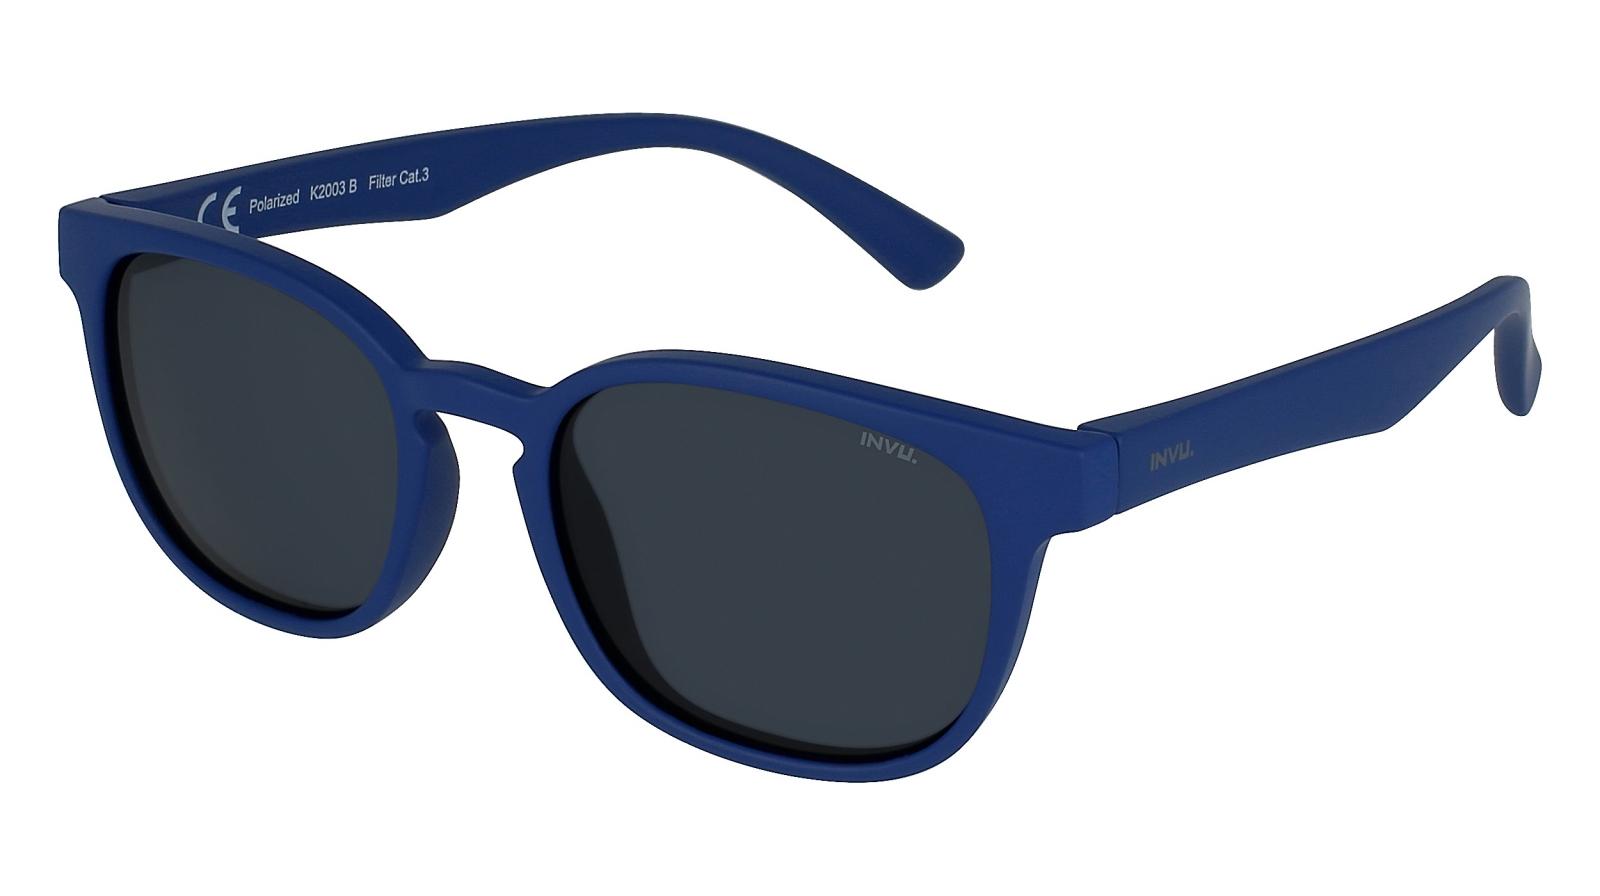 INVU. Kids K2003B - Slnečné okuliare pre deti 4-7 r.